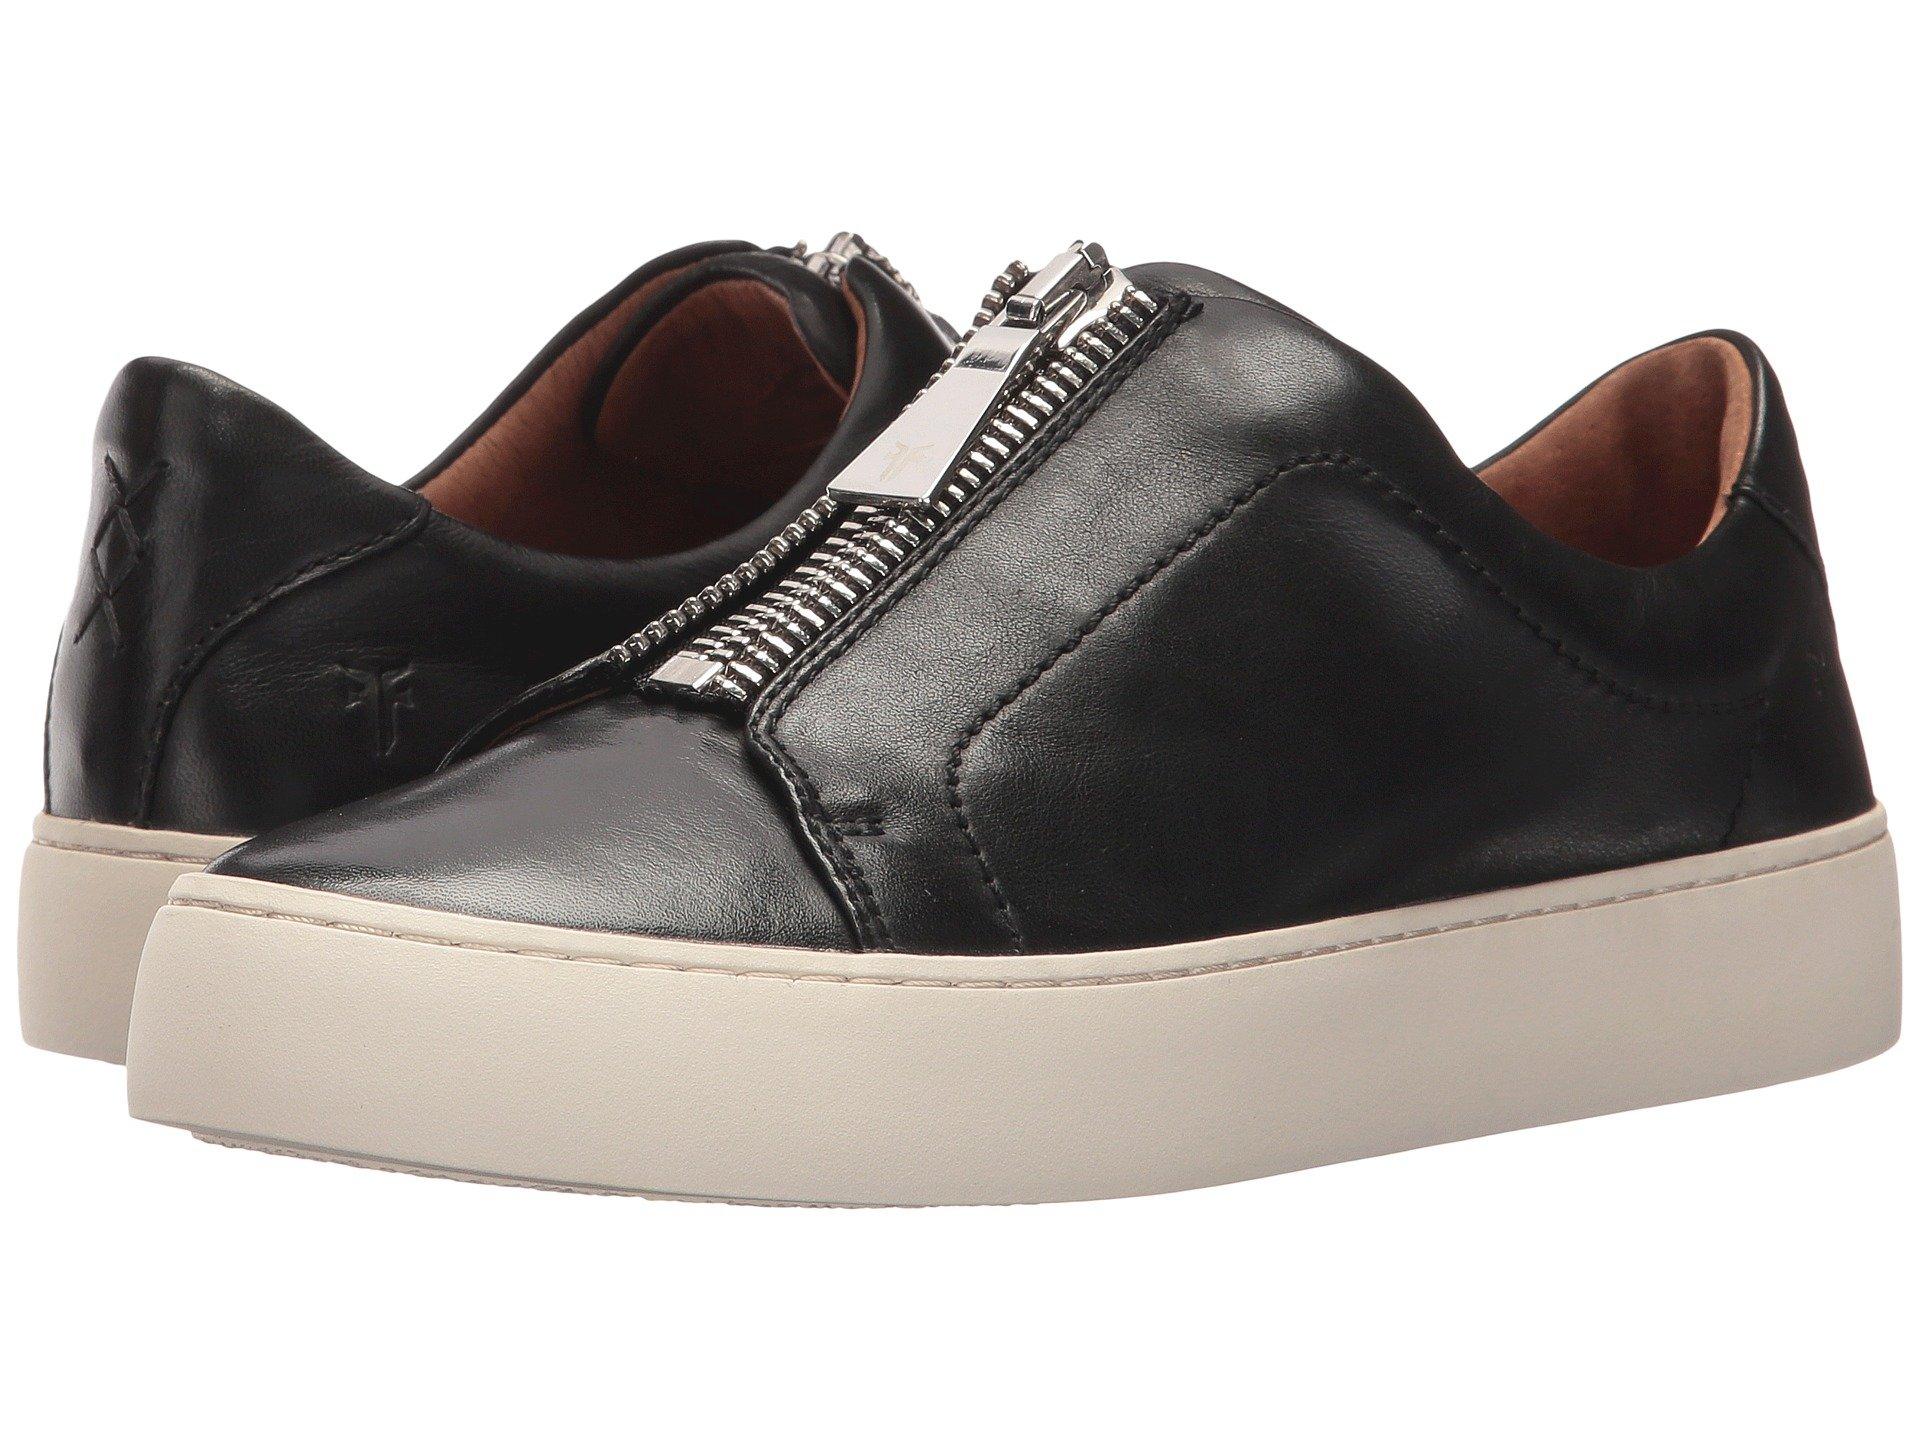 48ebe68b831c Frye Lifestyle Sneakers + FREE SHIPPING